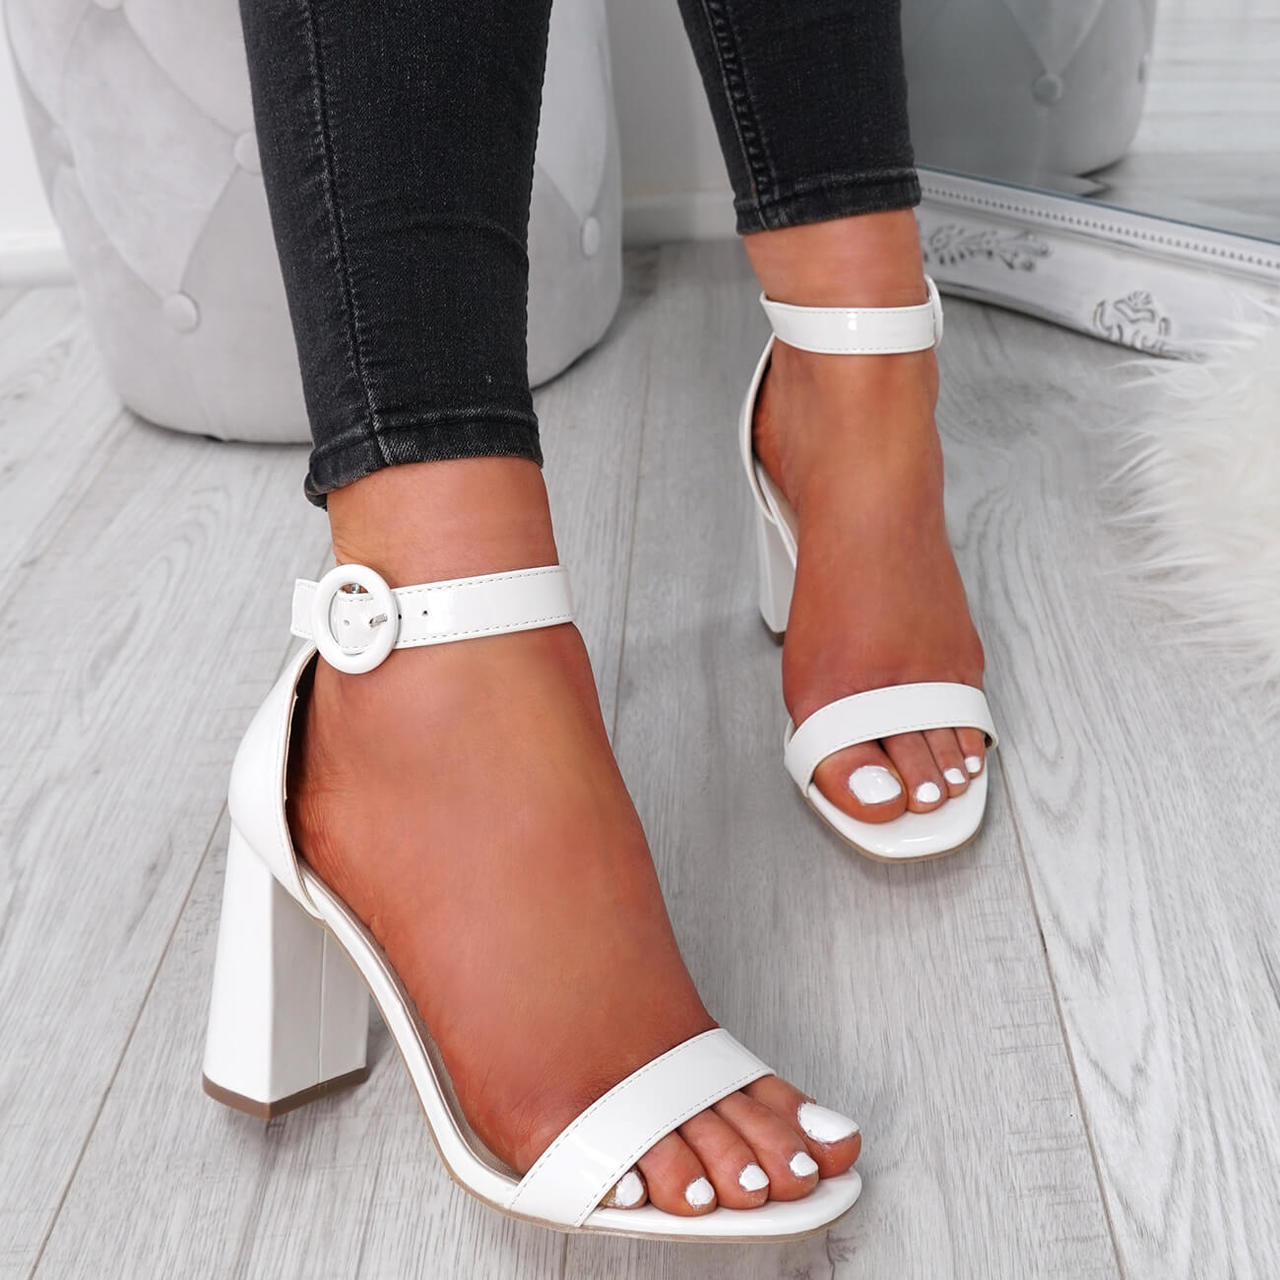 13985ffead9 Womens Ladies Ankle Strap Block Heel Peep Toe Sandals Summer Shoes ...